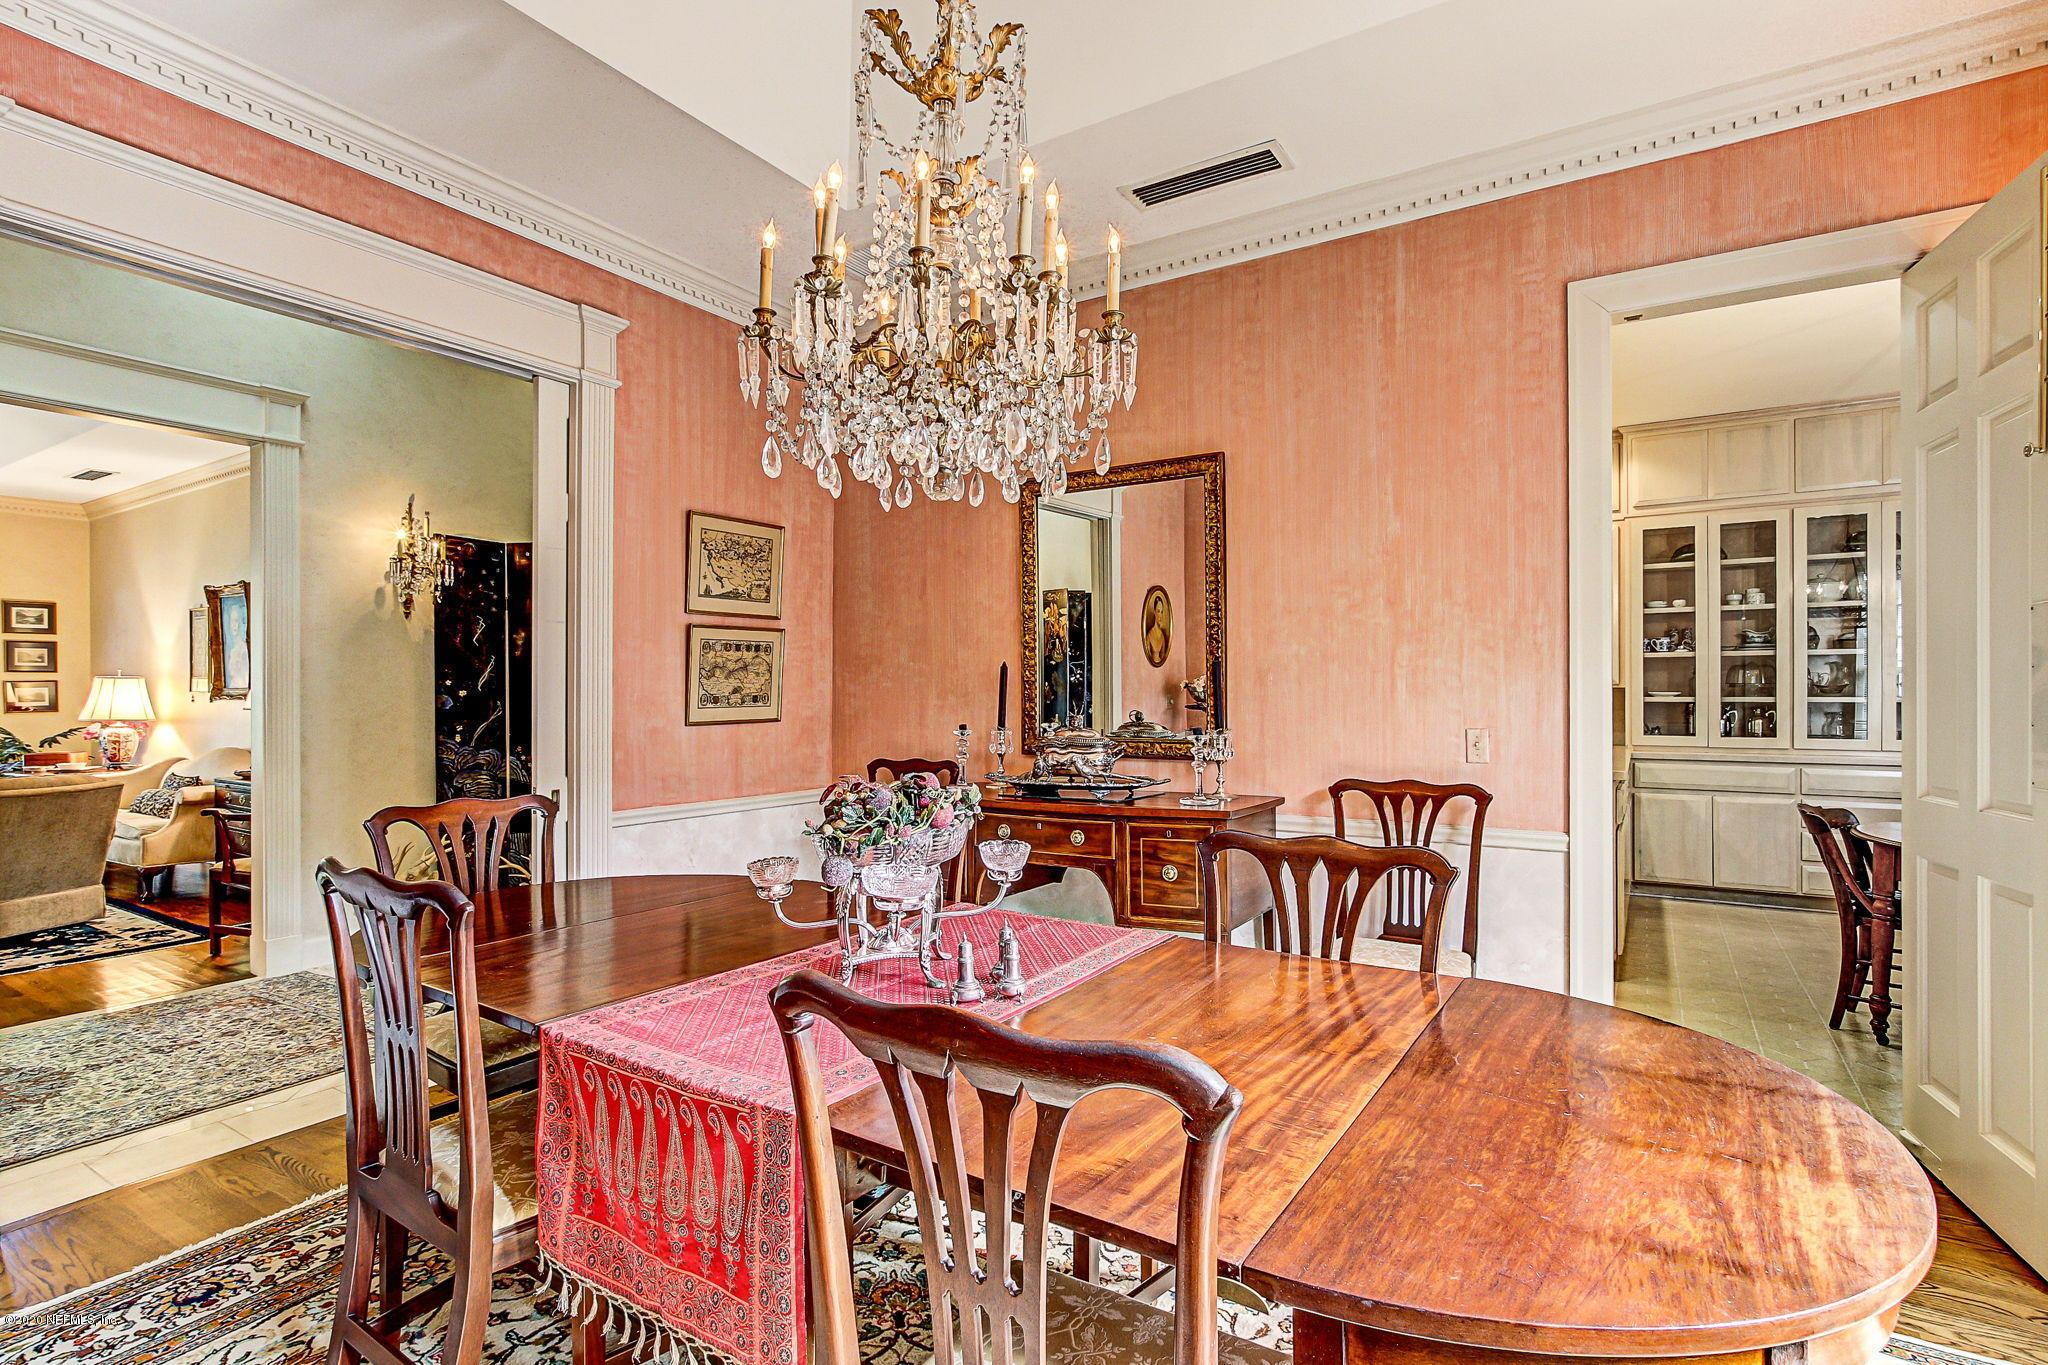 4160 ORTEGA, JACKSONVILLE, FLORIDA 32210, 2 Bedrooms Bedrooms, ,2 BathroomsBathrooms,Residential,For sale,ORTEGA,1045328